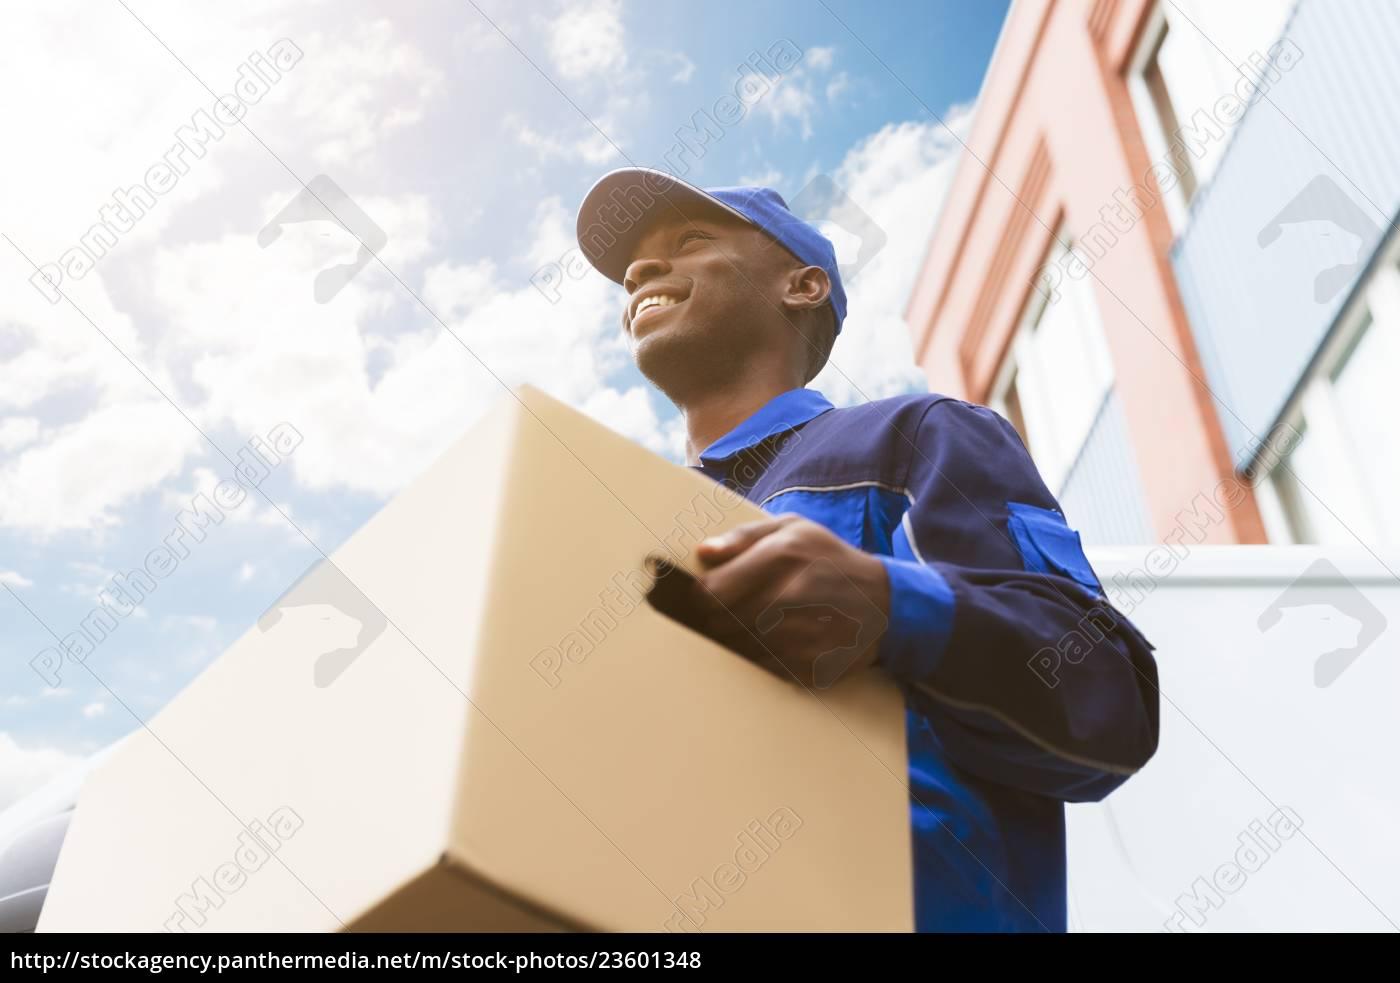 loader, man, with, cardboard, box - 23601348